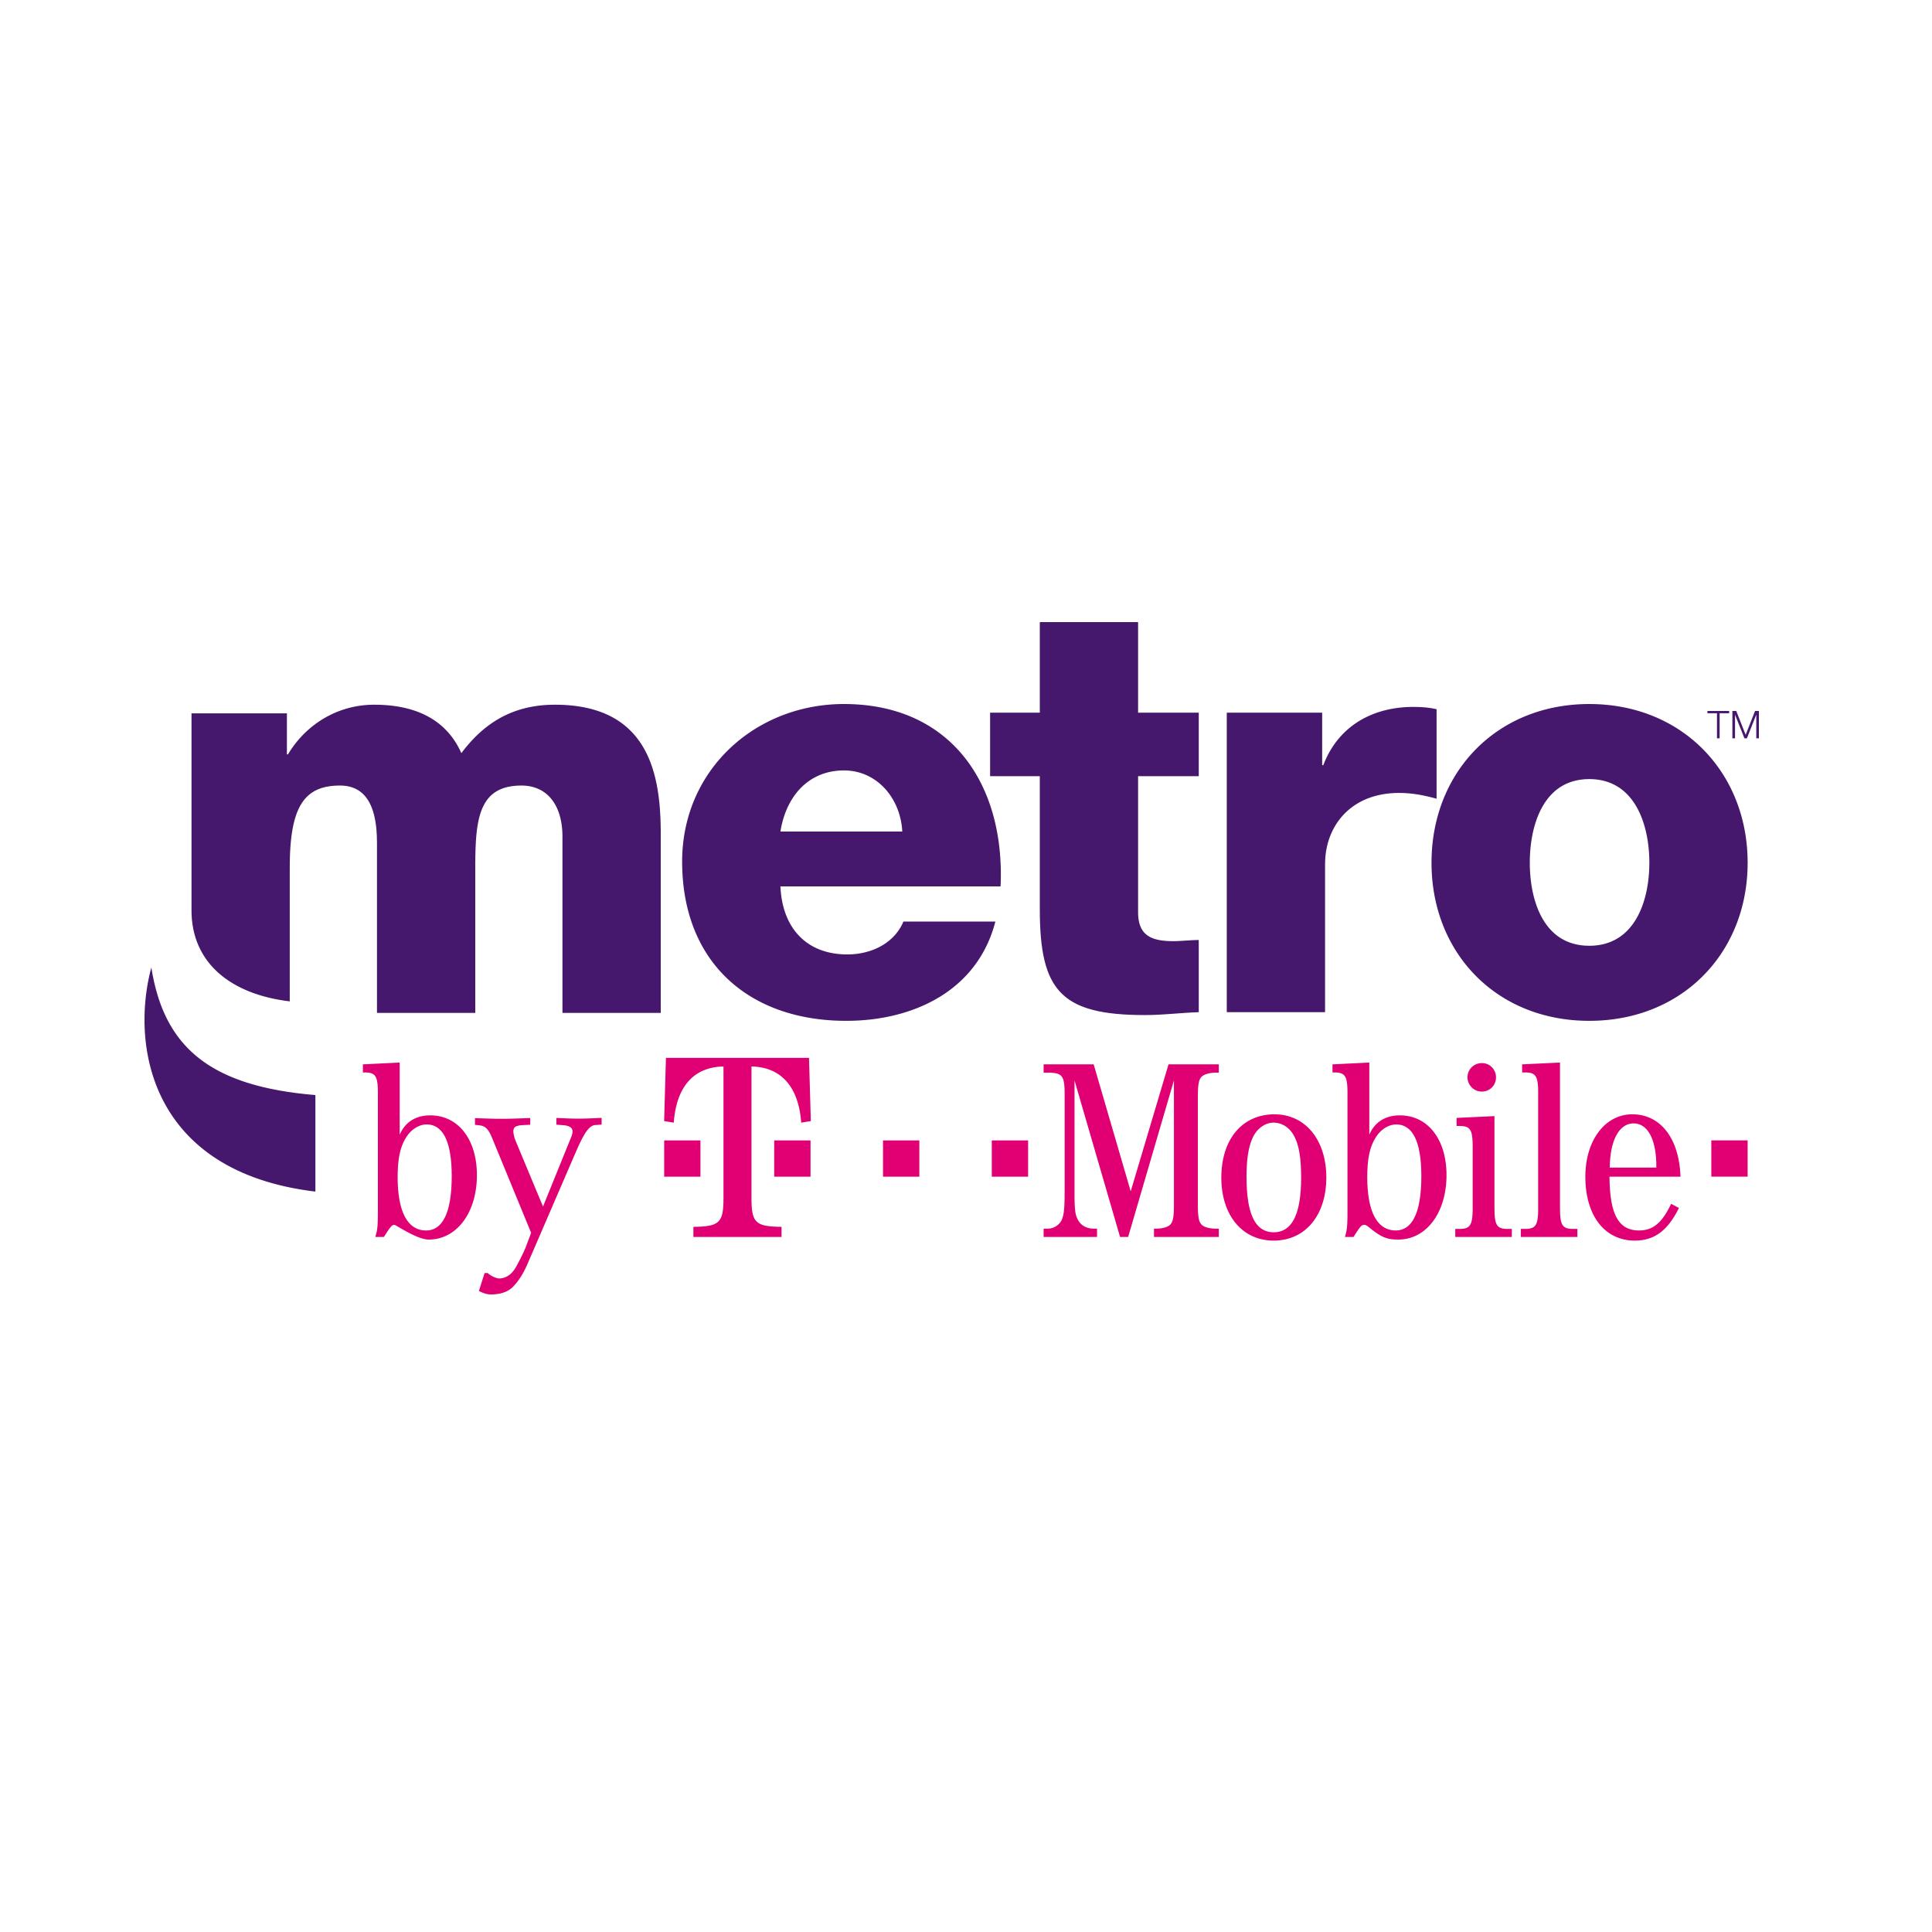 MetroPCS Chesapeake